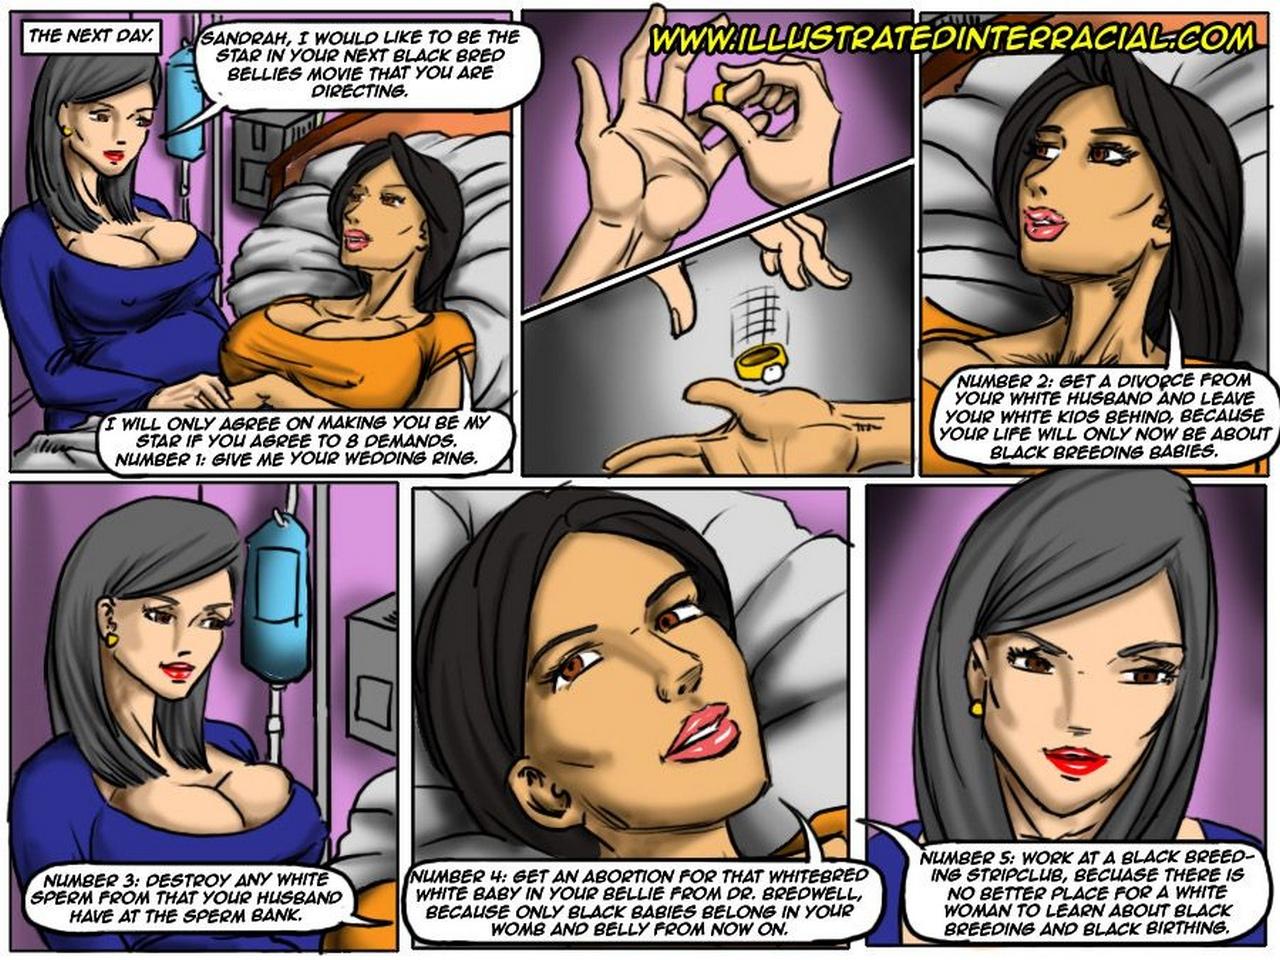 Black-Breeding-Network-3 10 free sex comic